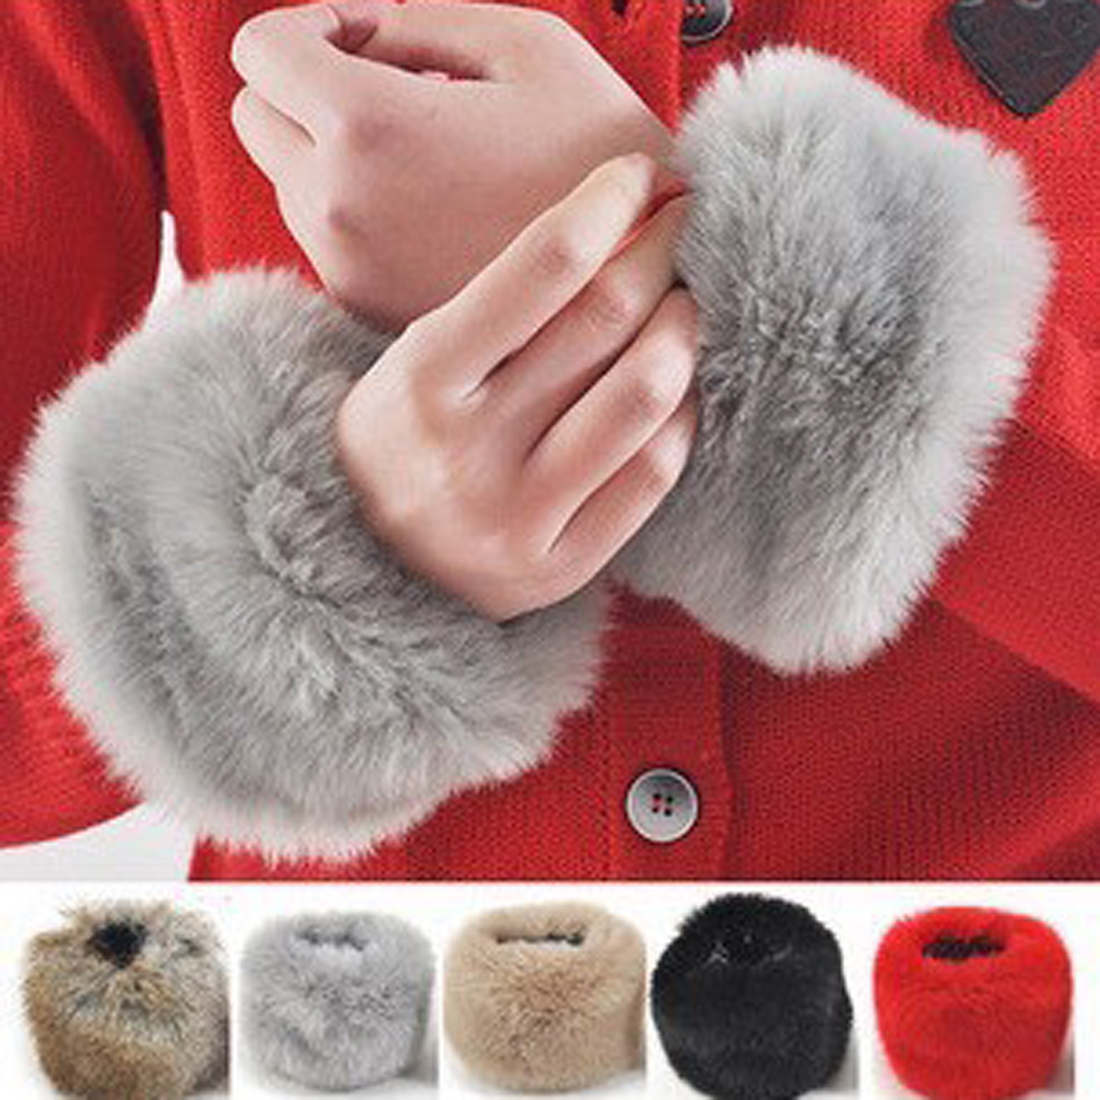 1 Pair Women Fashion Winter Warm Faux Fur Elastic Wrist Slap On Cuffs Ladies Solid Color Arm Warmer Plush Wrist Protector